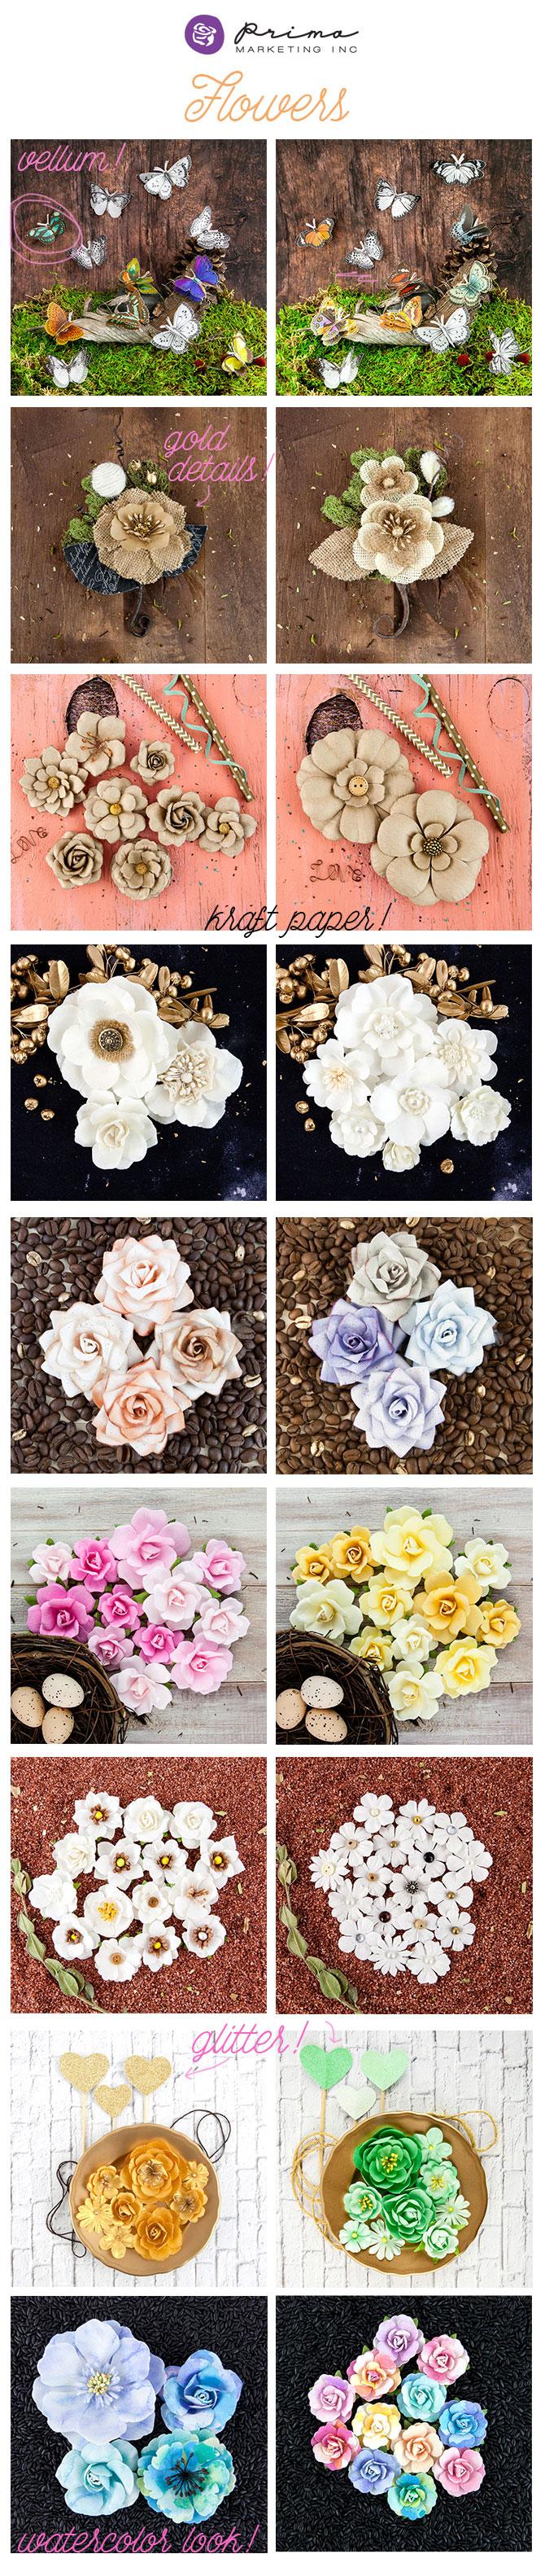 SP_FLOWERS